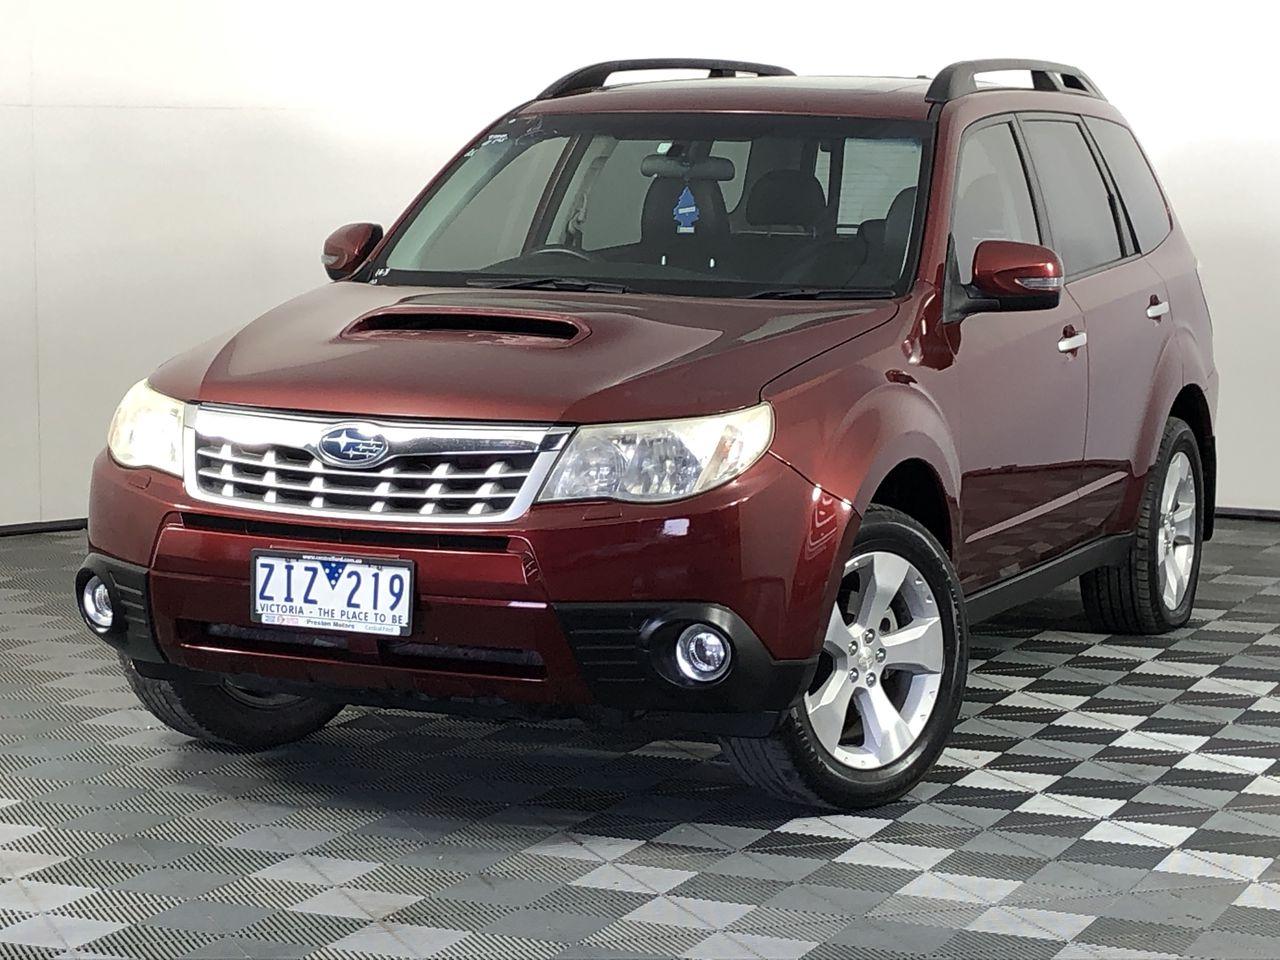 2012 Subaru Forester 2.0D Premium S3 Turbo Diesel Manual Wagon